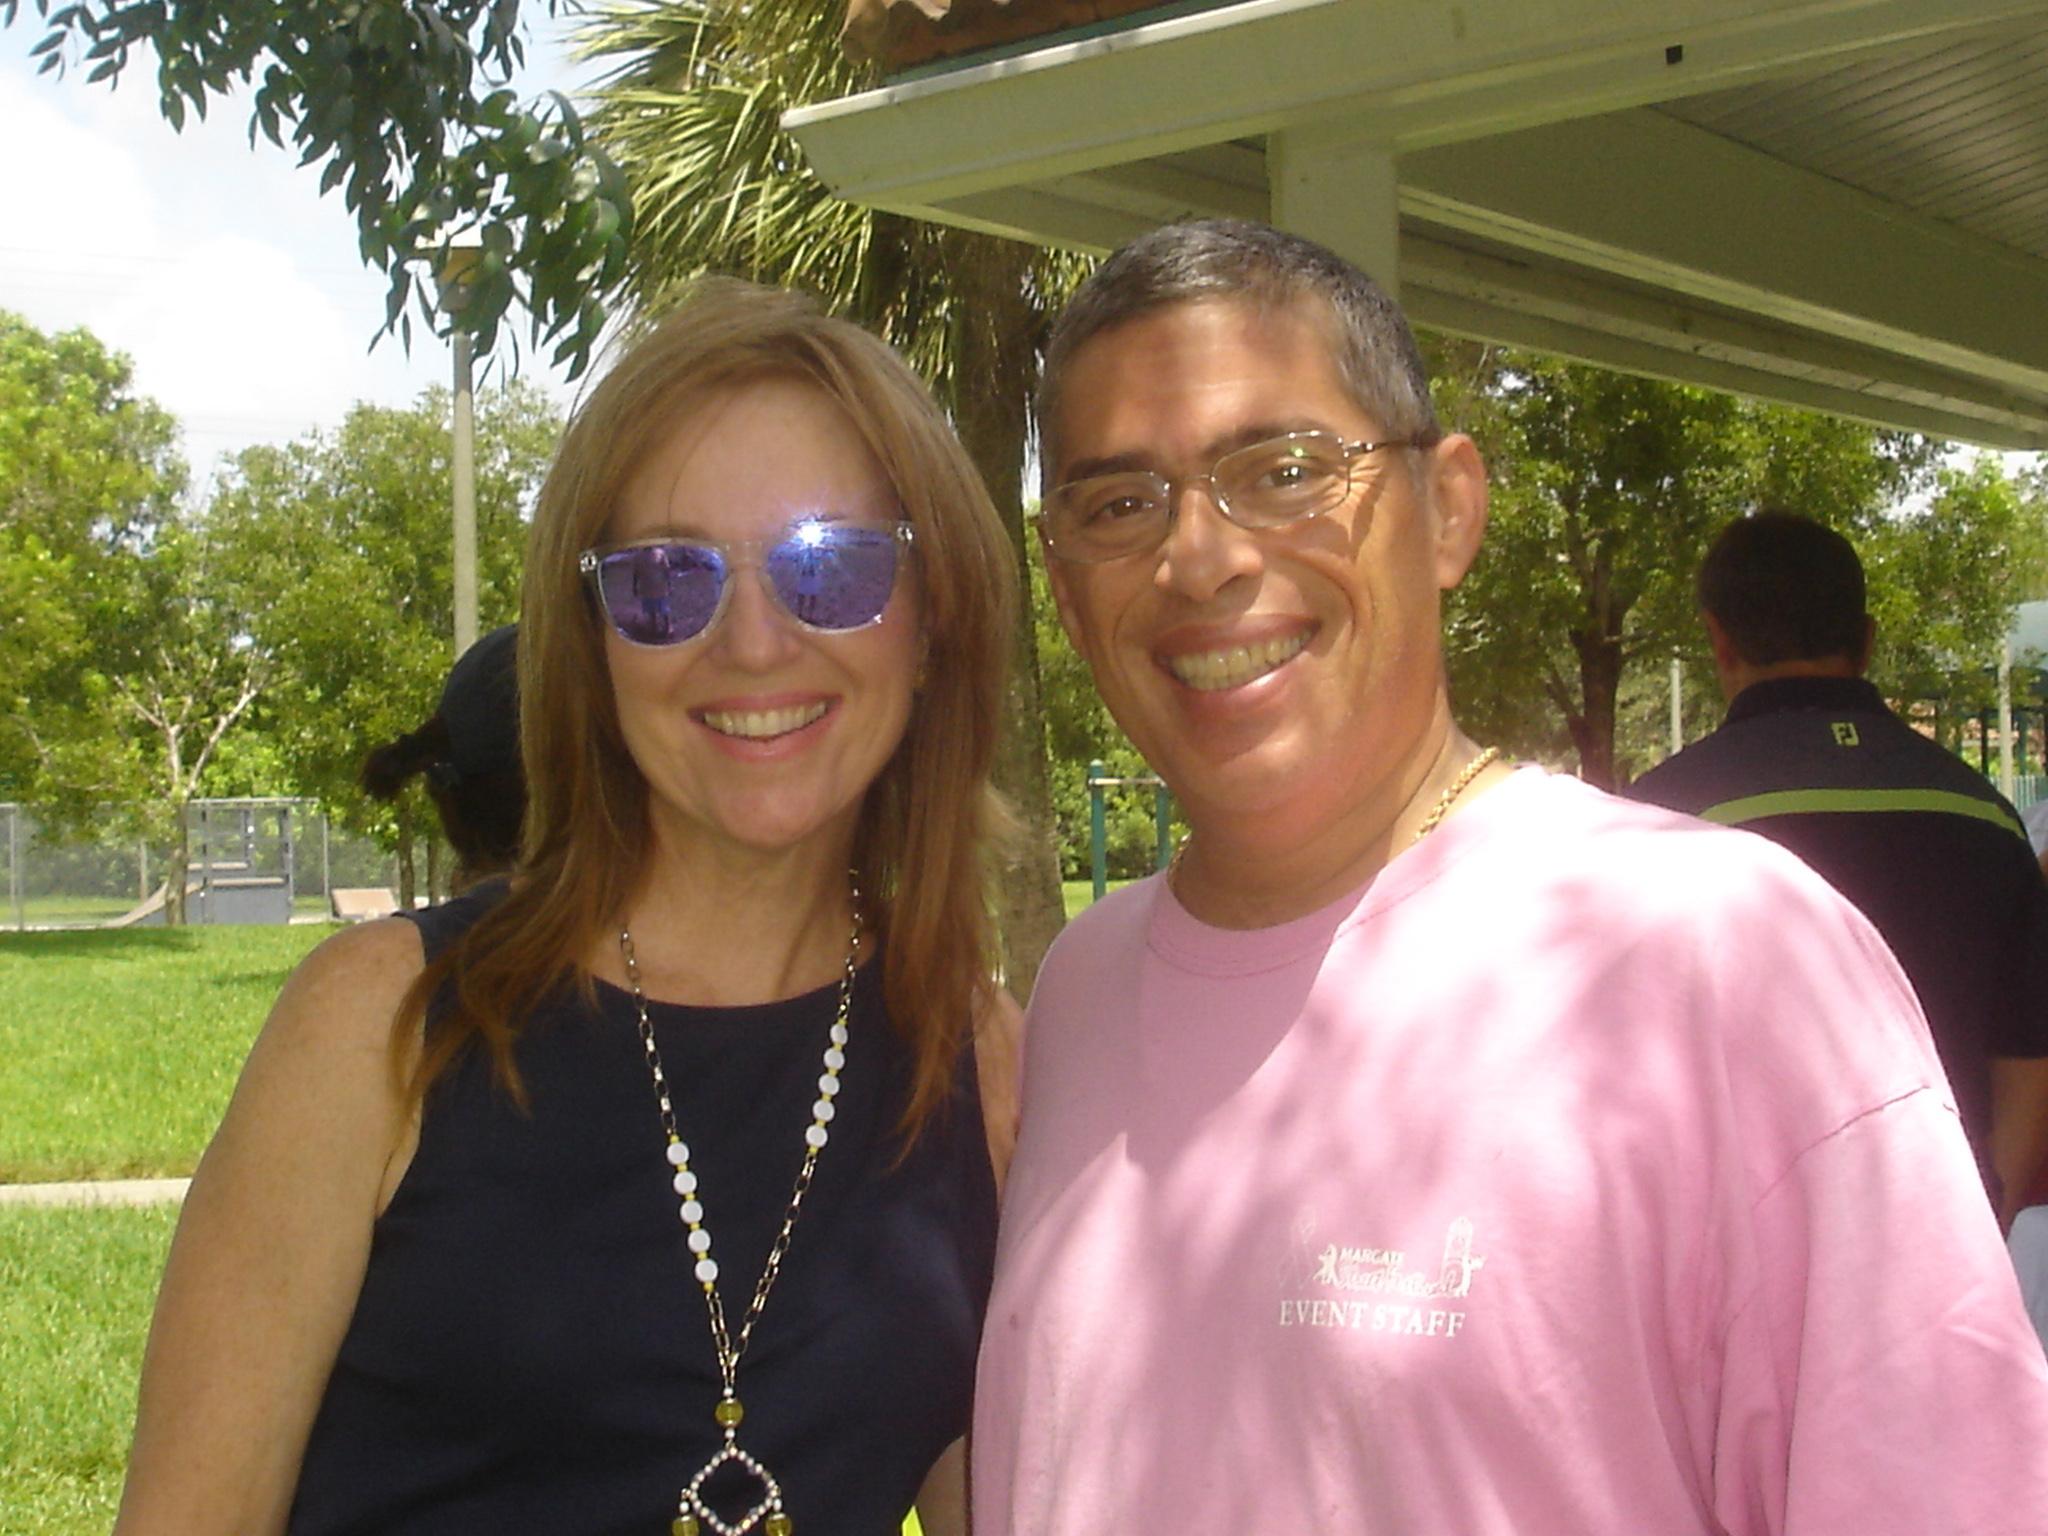 with Kristin Jacobs